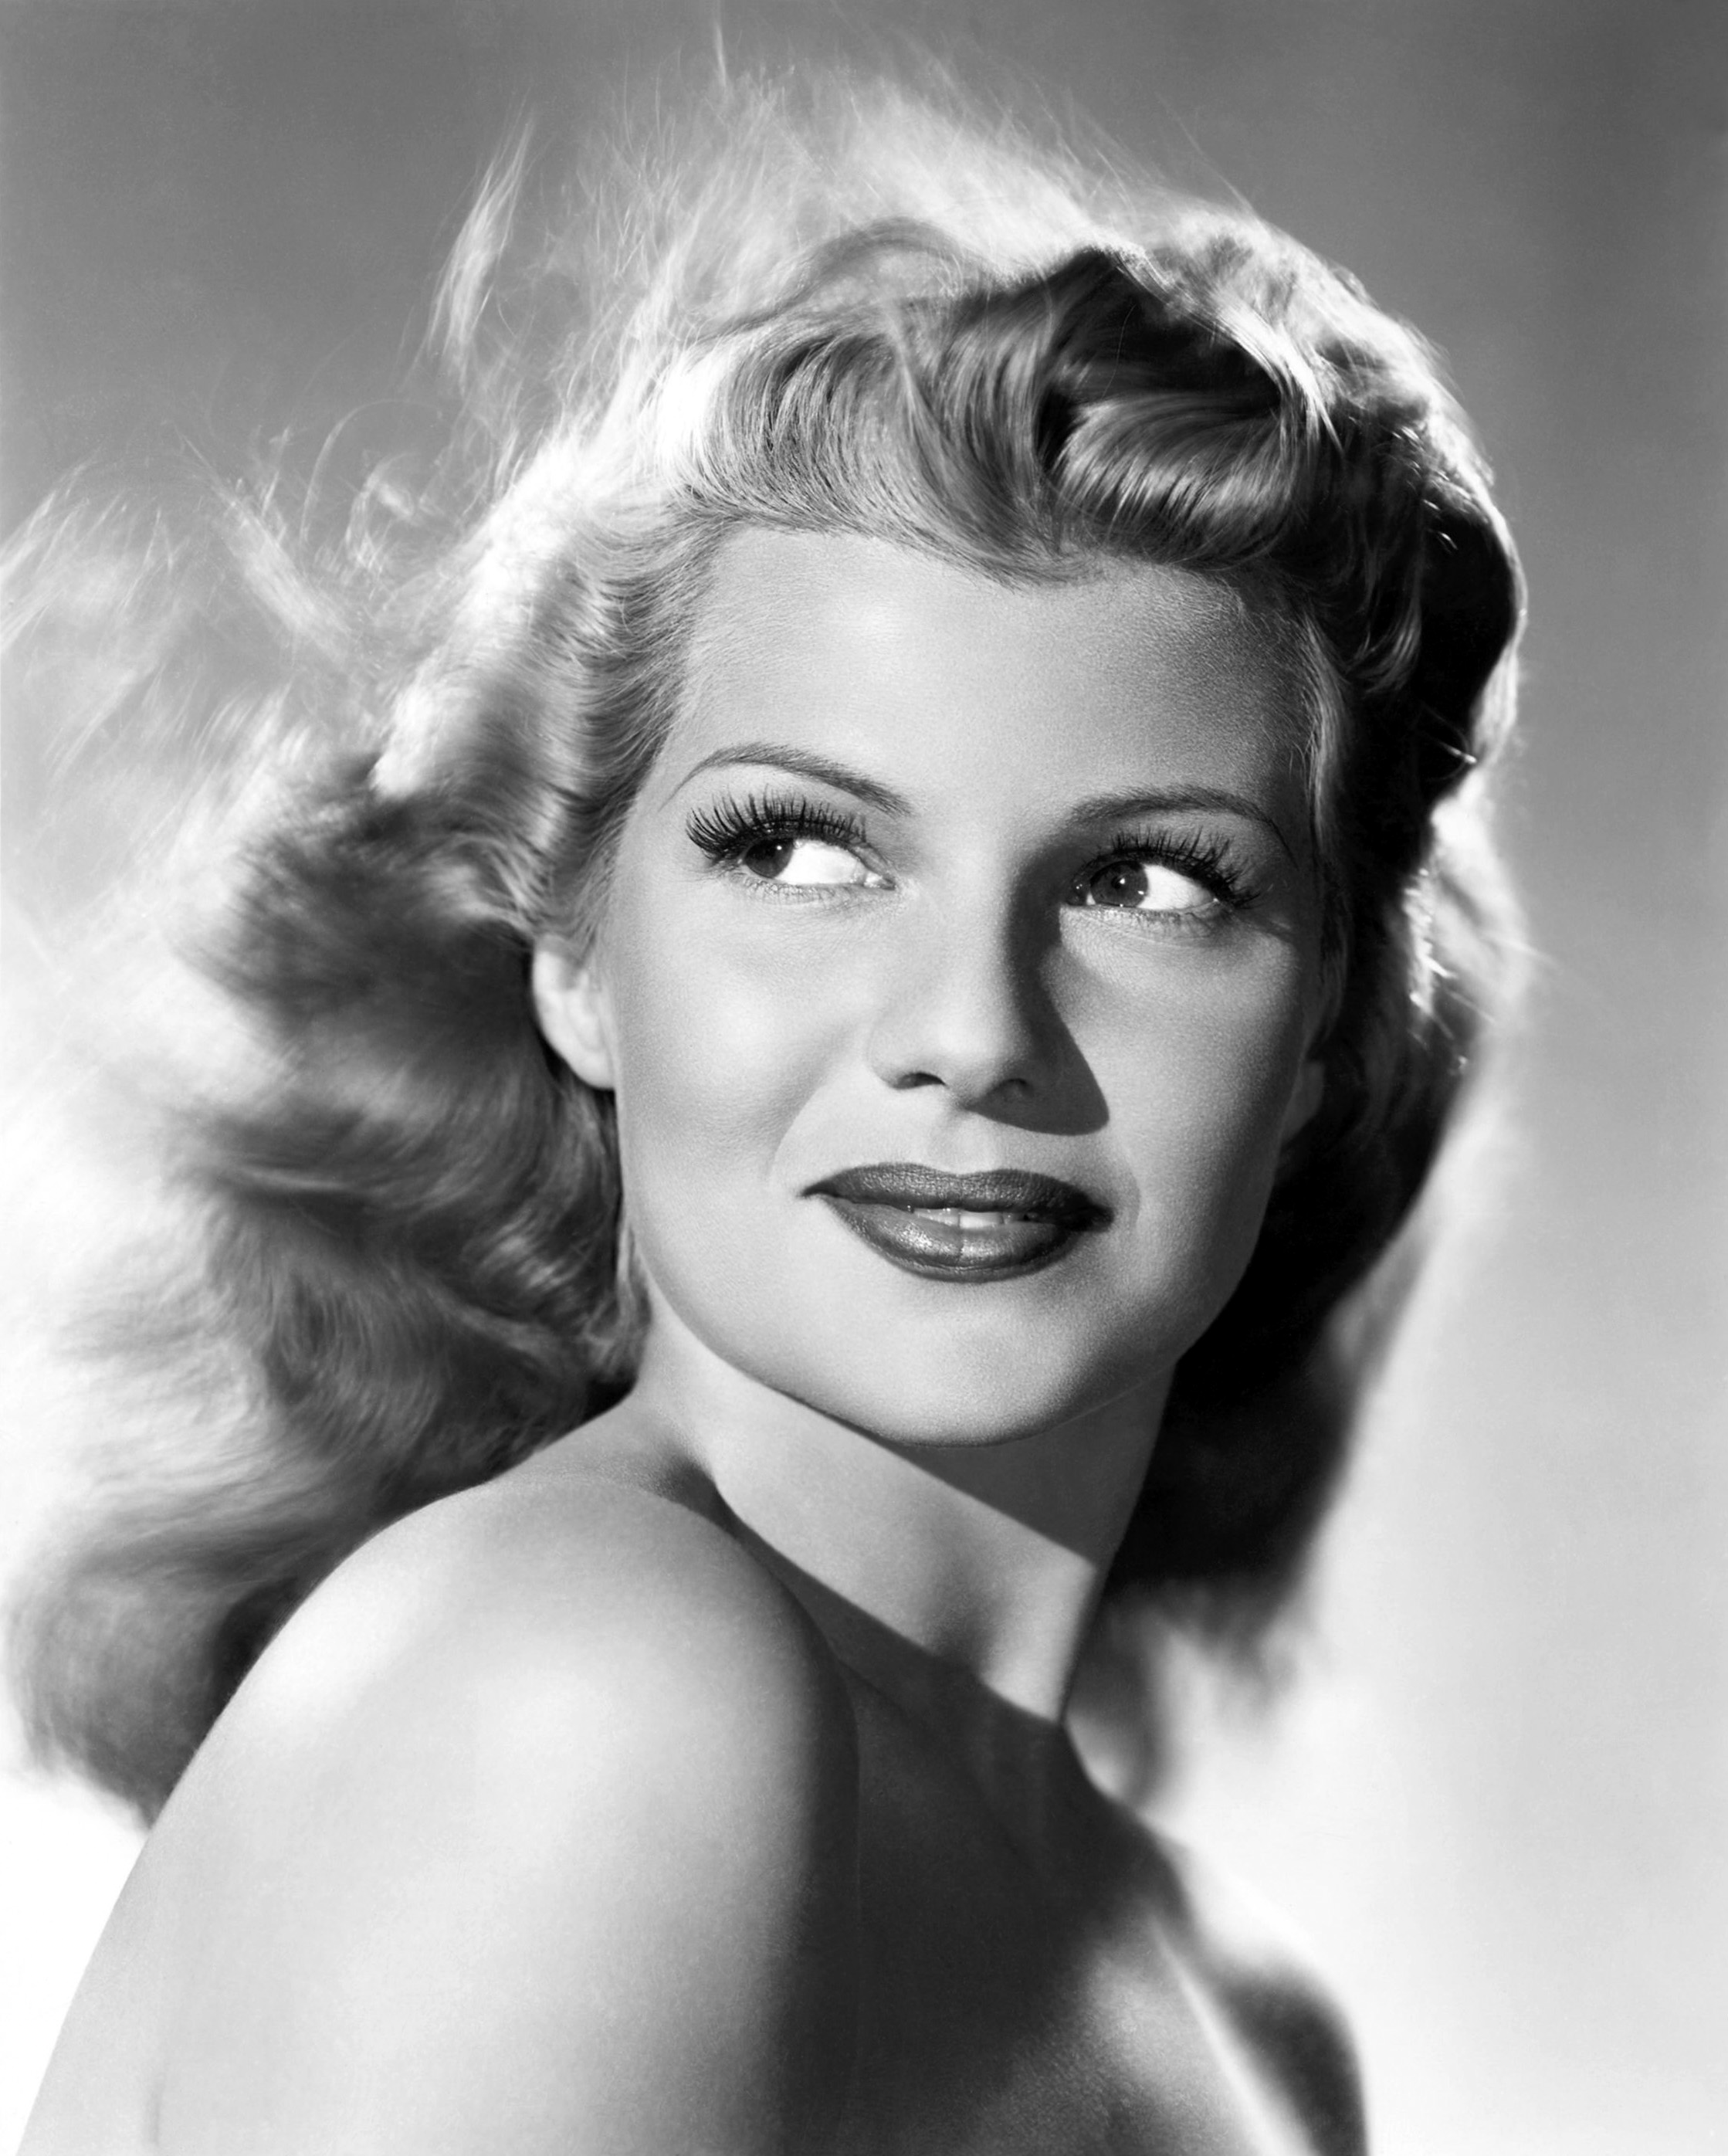 Rita Hayworth - Wallpaper Hot